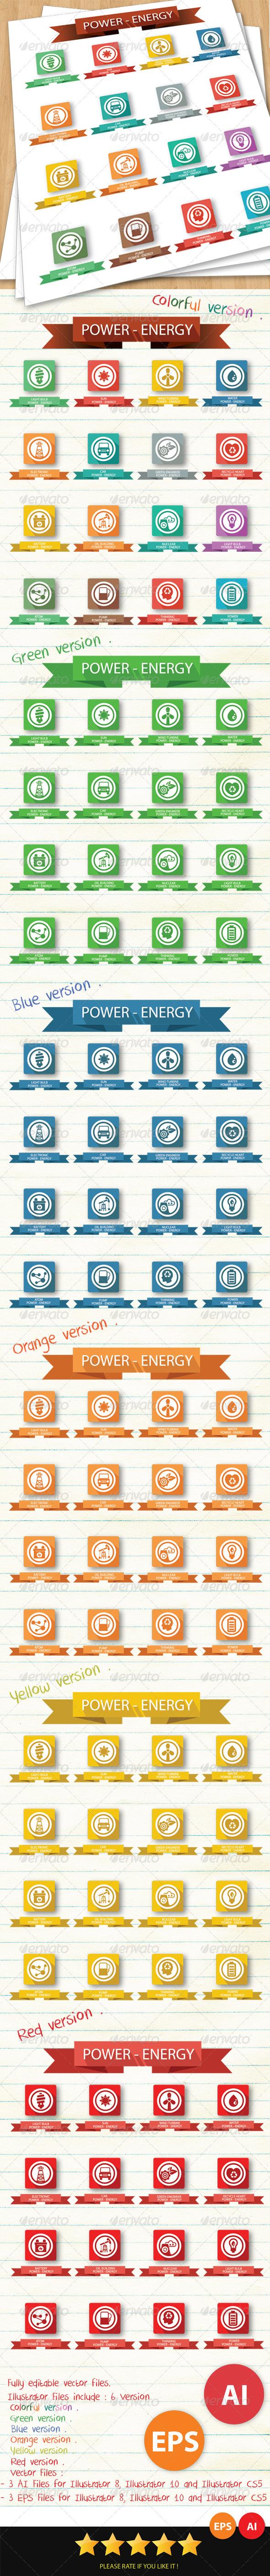 Power & Energy Icons - Icons